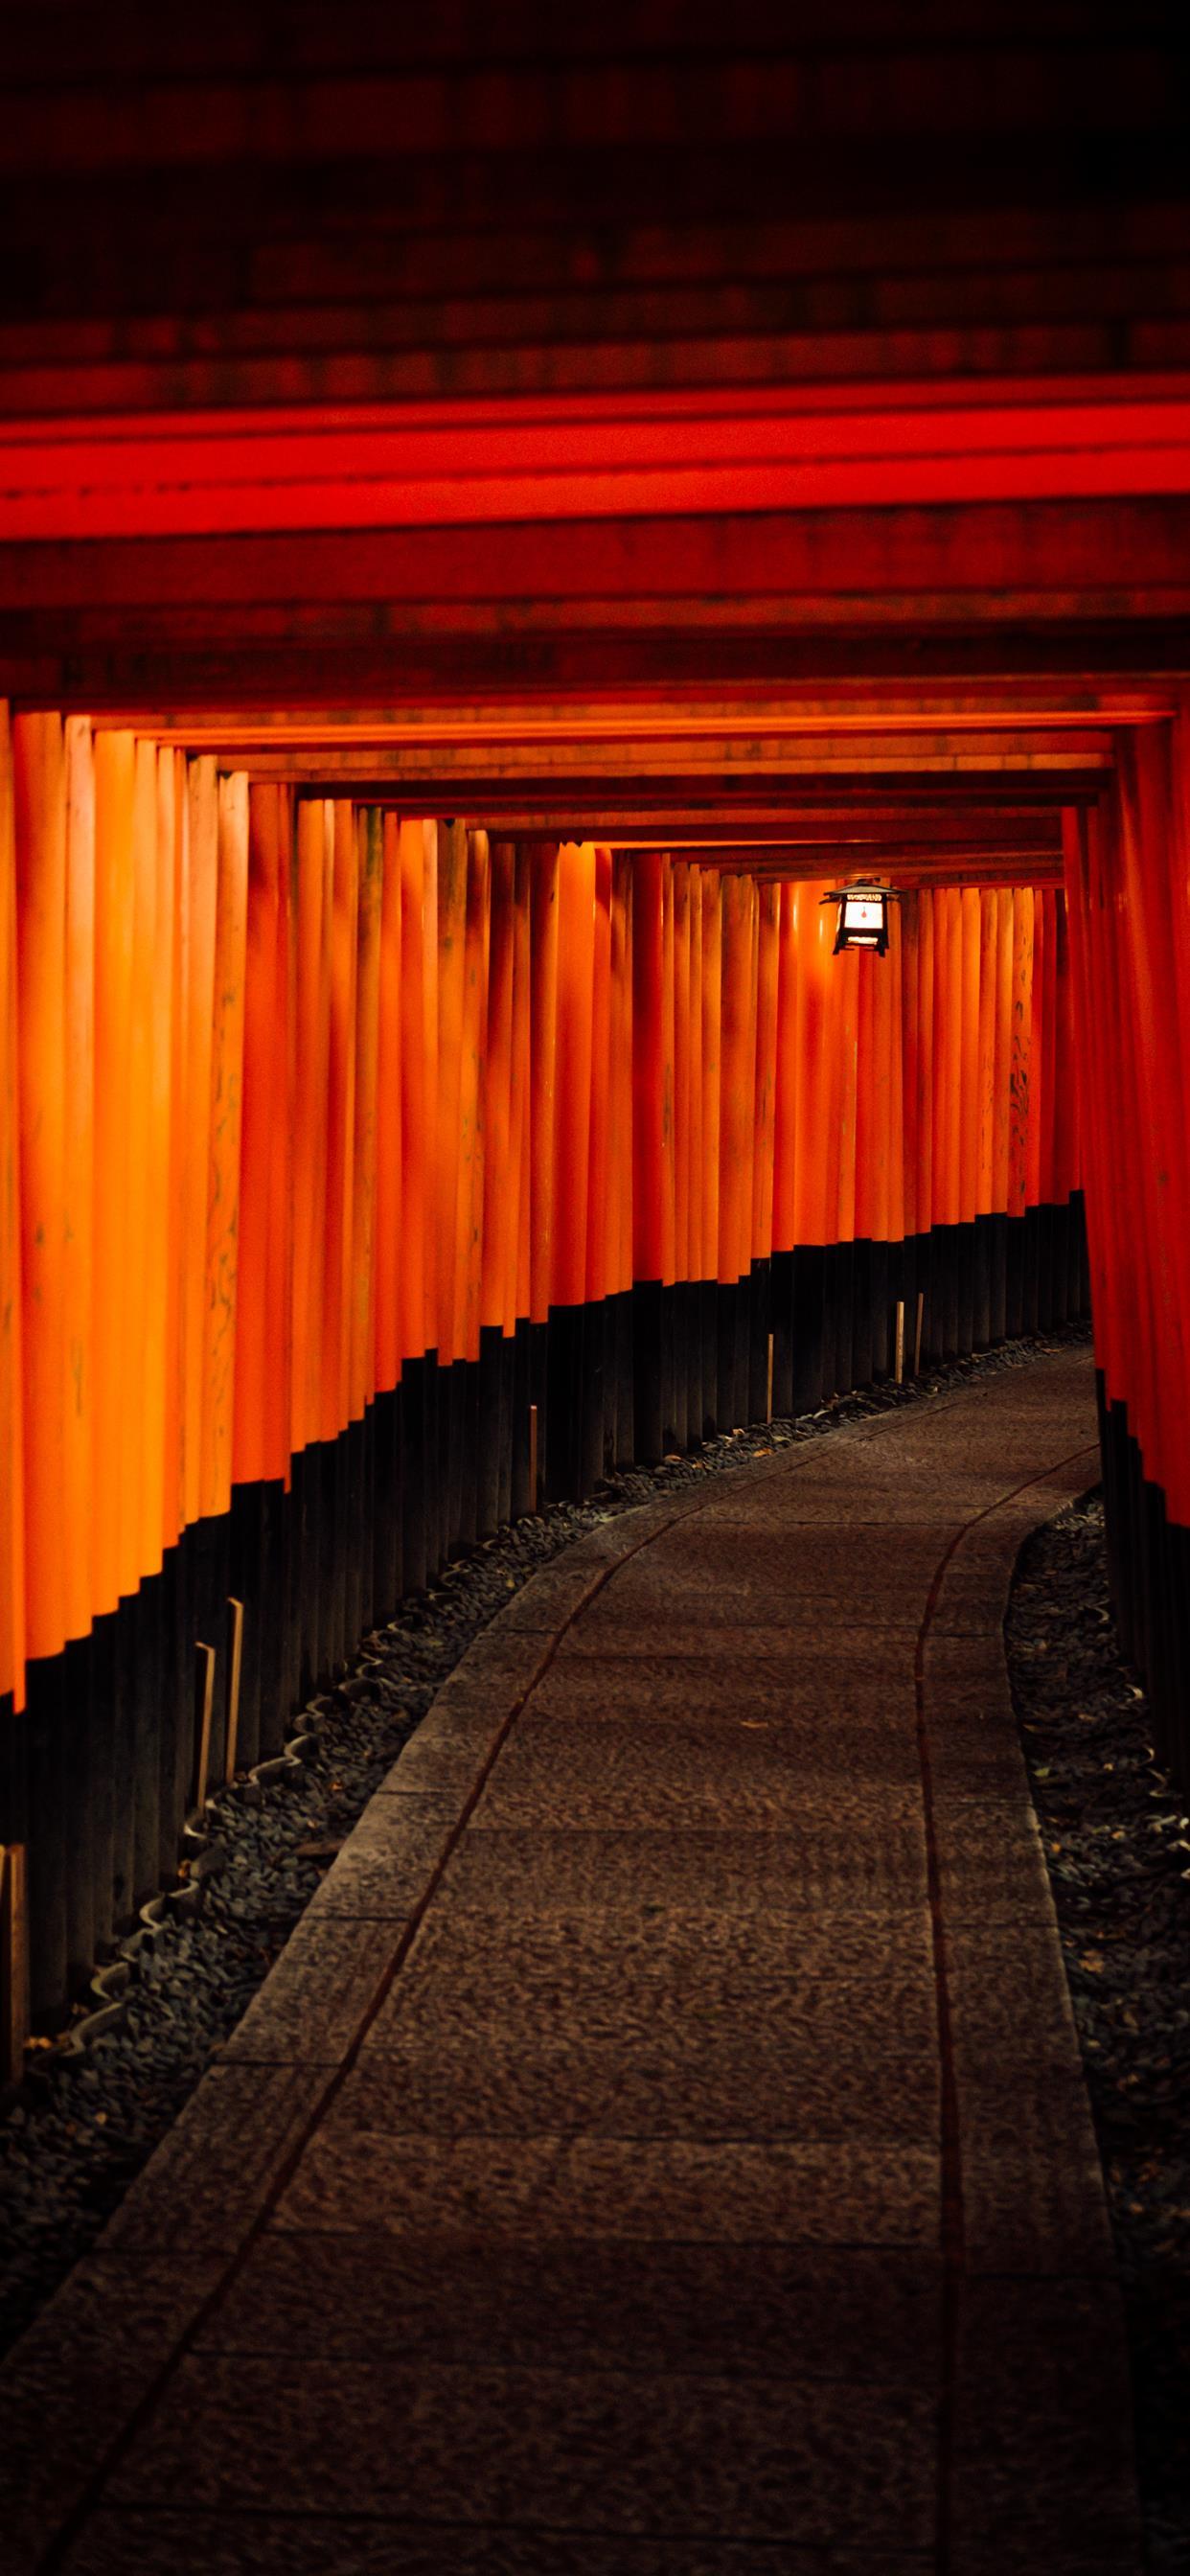 Fushimi Inari Taisha Kyoto Japan Iphone X Wallpapers Free Download